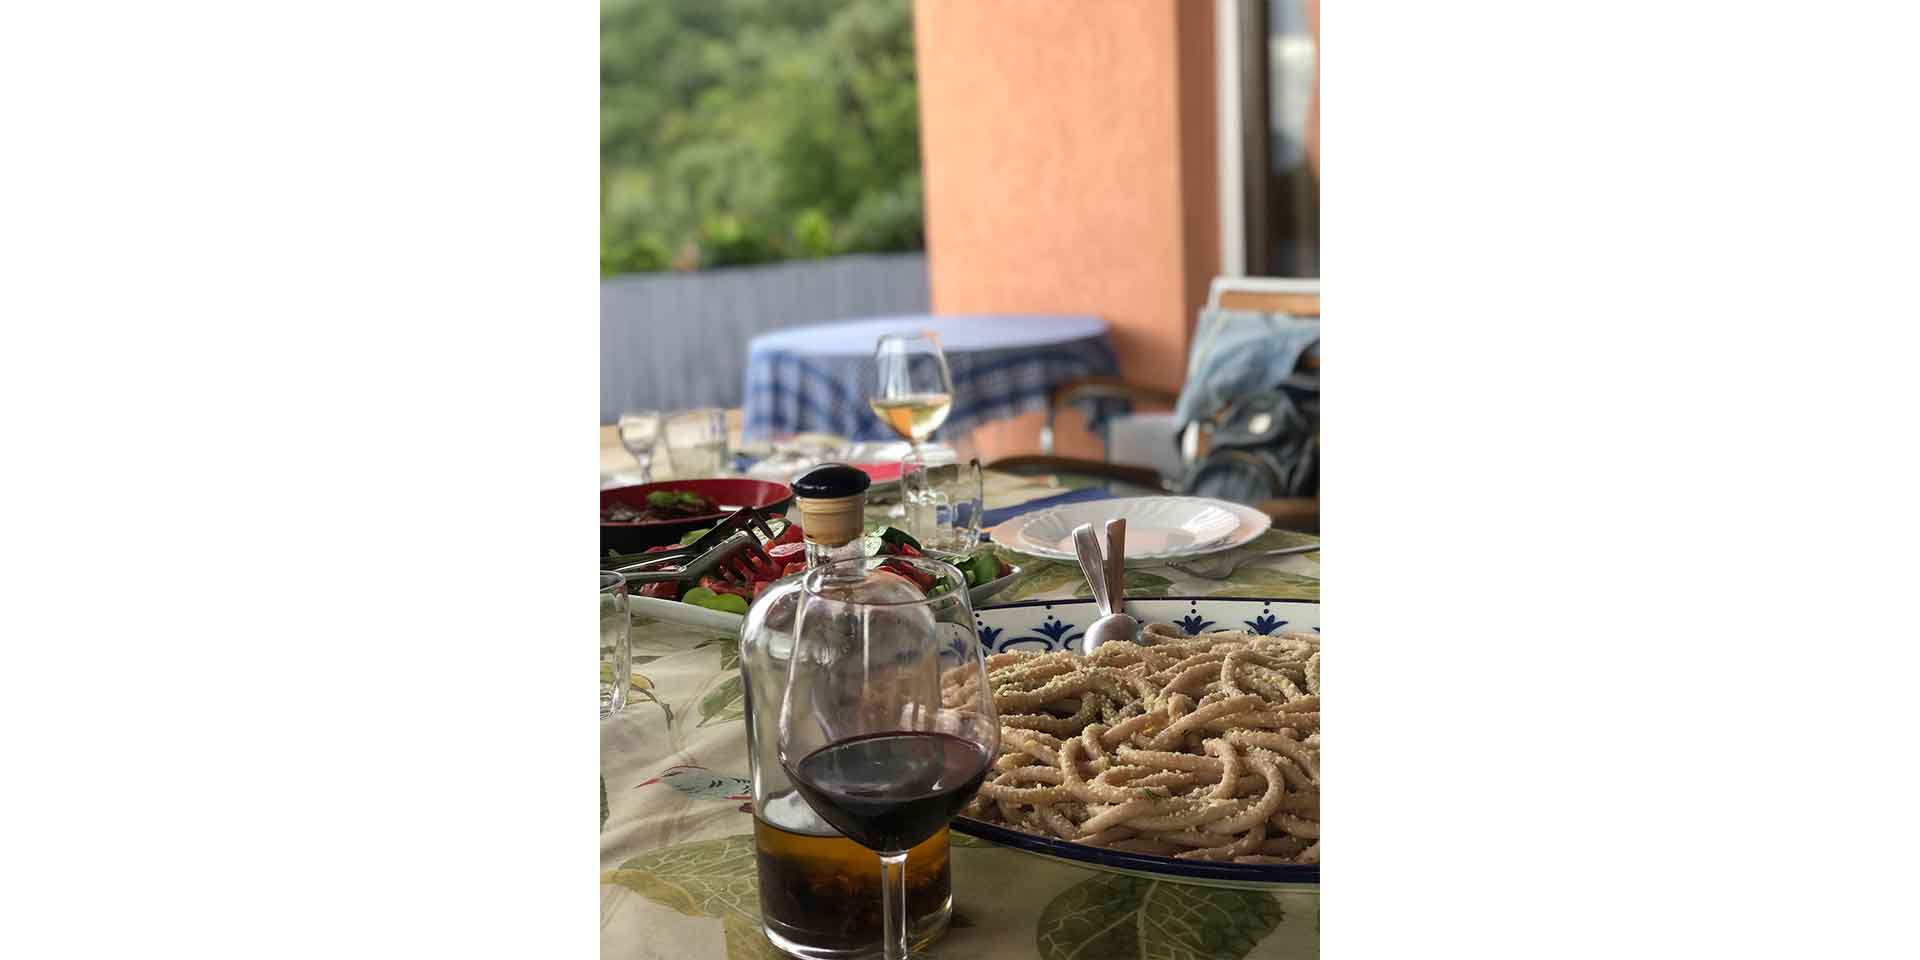 budva-nightlife budva-food budva-camps montenegro budva-beach